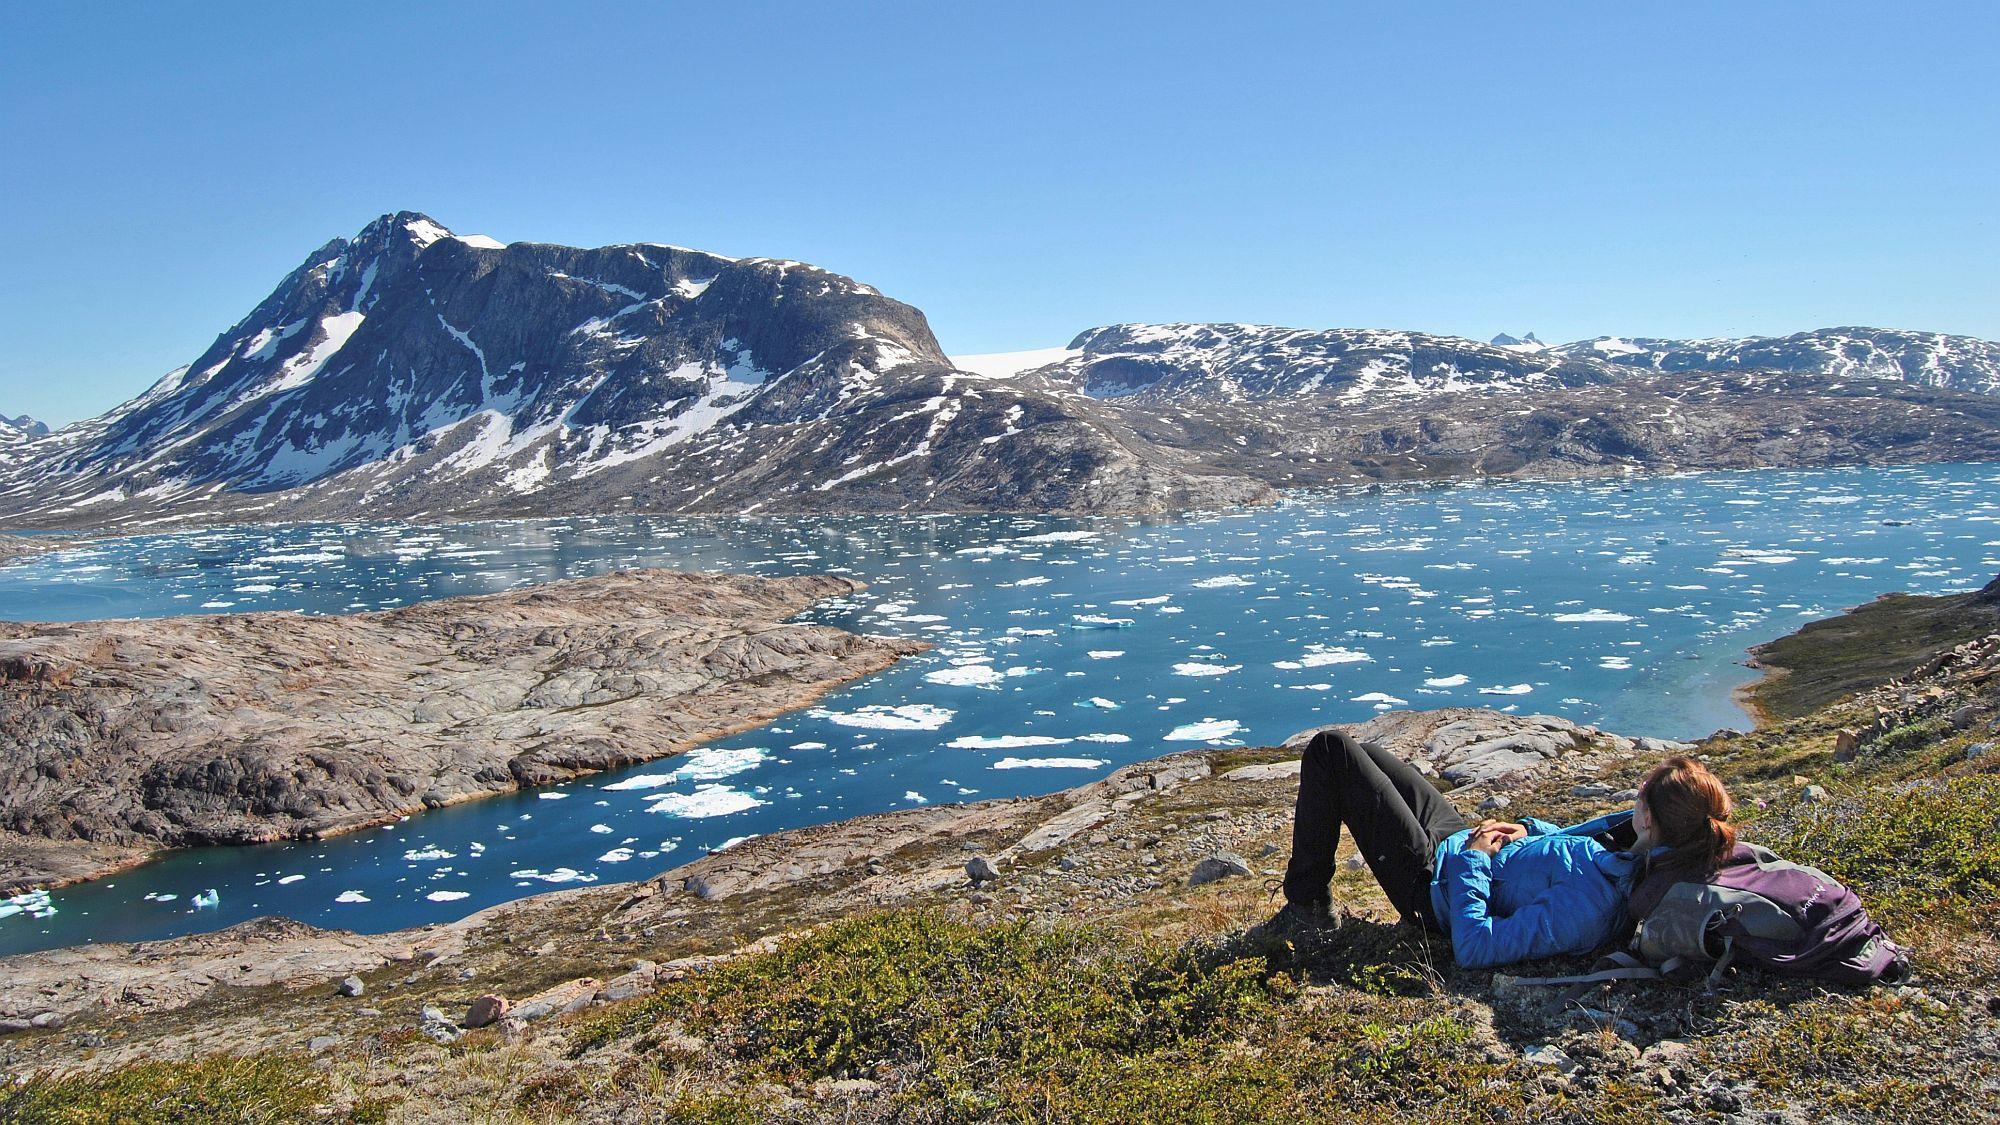 Grönland Sommer Pause amFjord